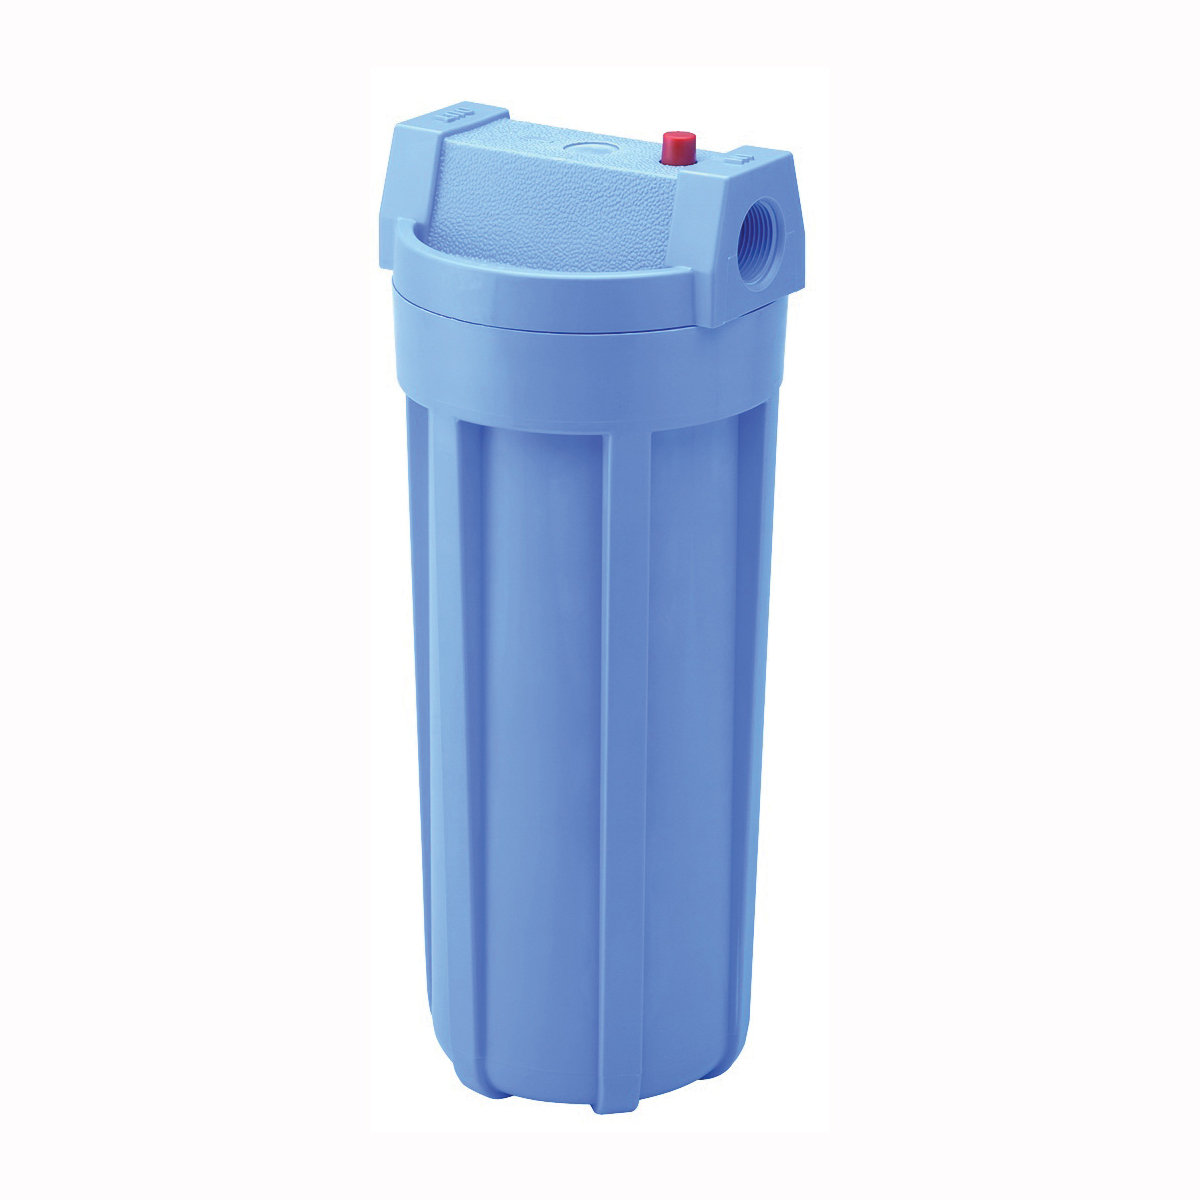 Picture of Culligan HF-150A Water Filter Housing, 5 um Filtration, Polypropylene